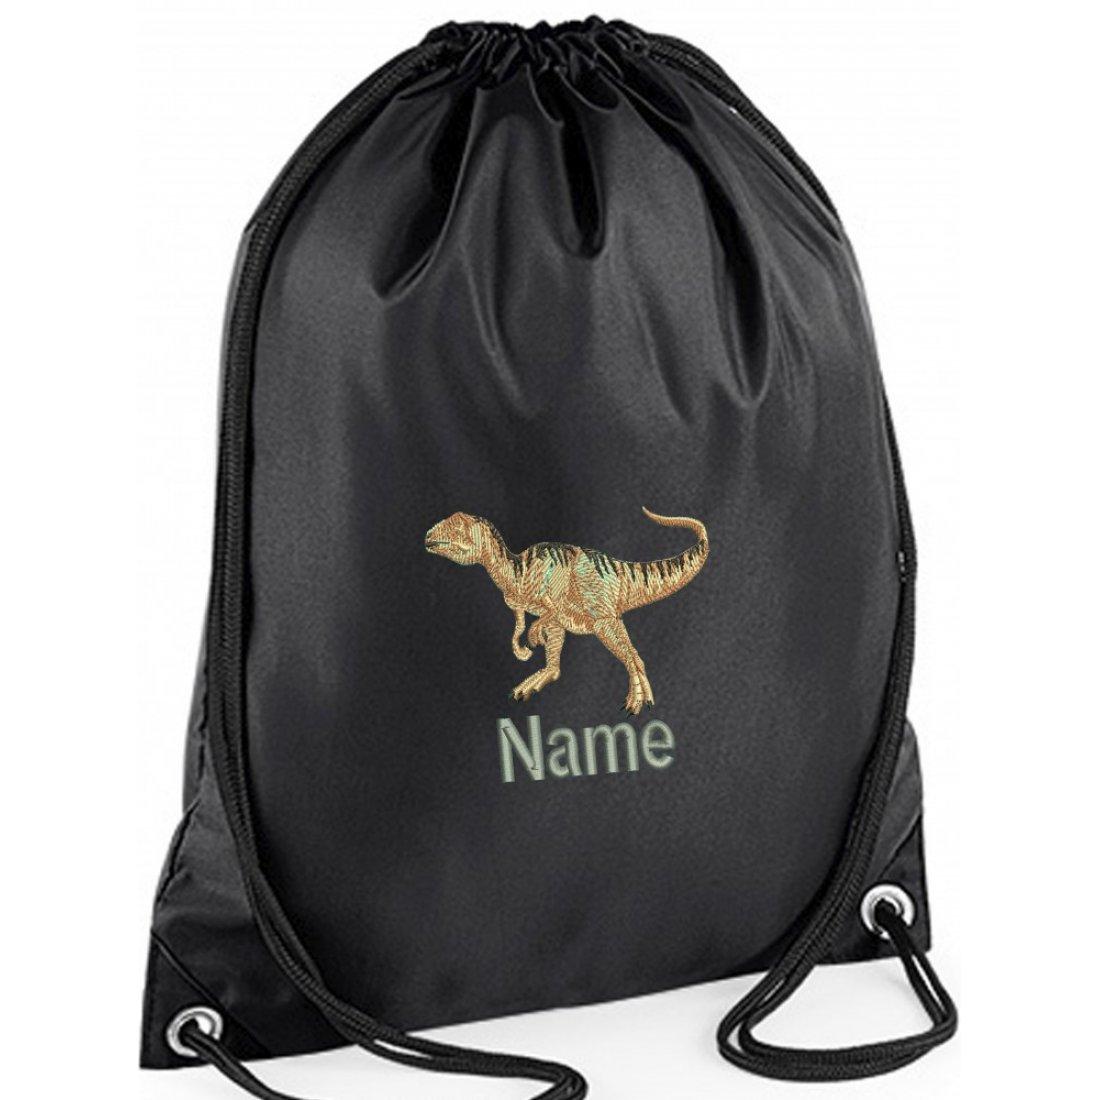 Embroidered Dinosaur Gym Bag